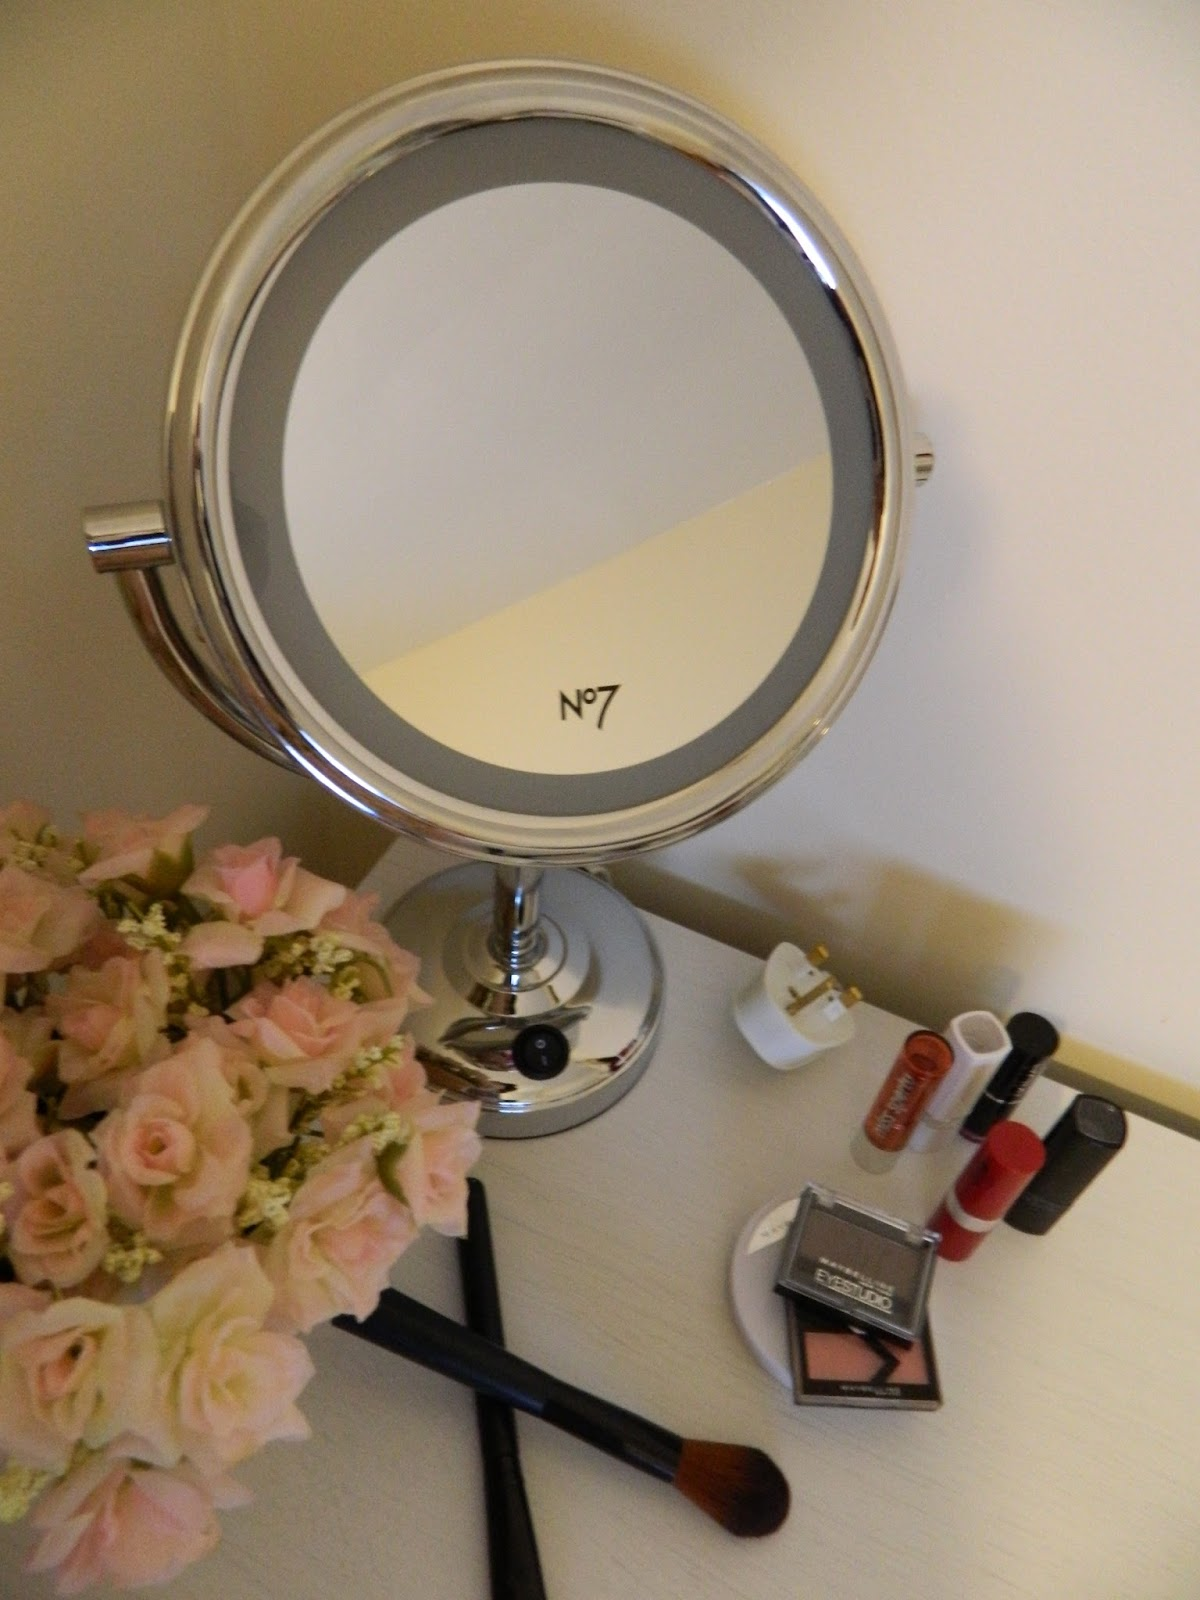 No7 Illuminated Makeup Mirror Boots Ebay